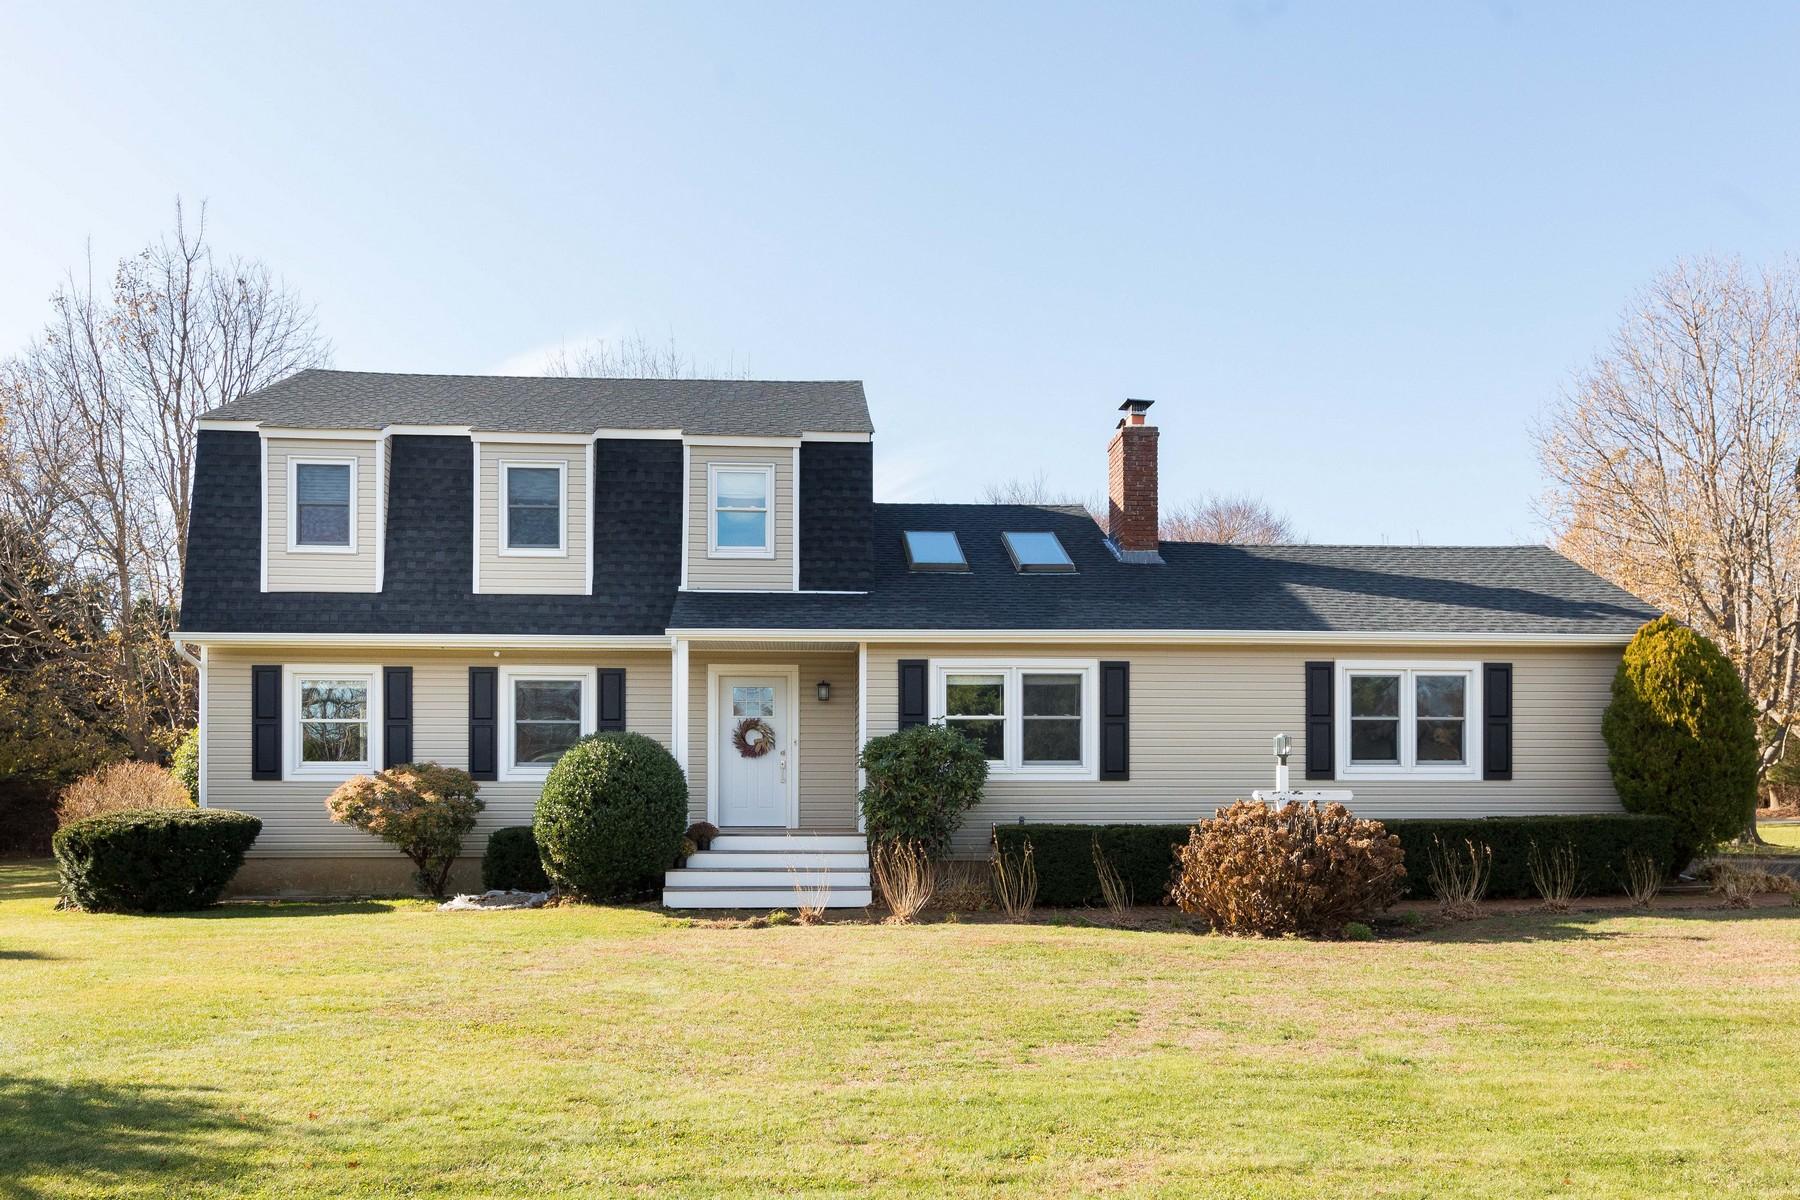 Single Family Homes for Sale at Mattituck 2095 Elijahs Ln Mattituck, New York 11952 United States